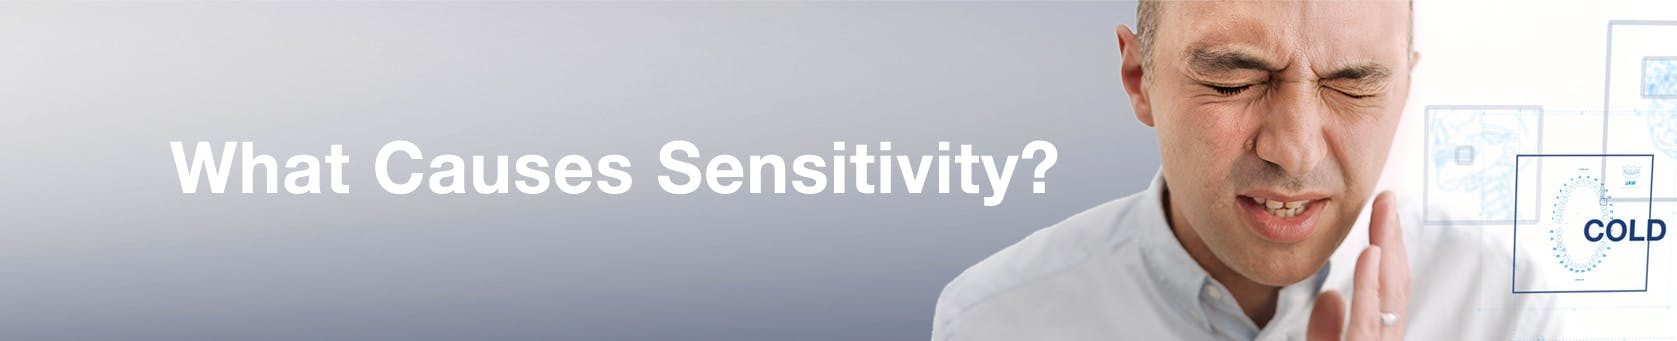 Causes of Sensitivity